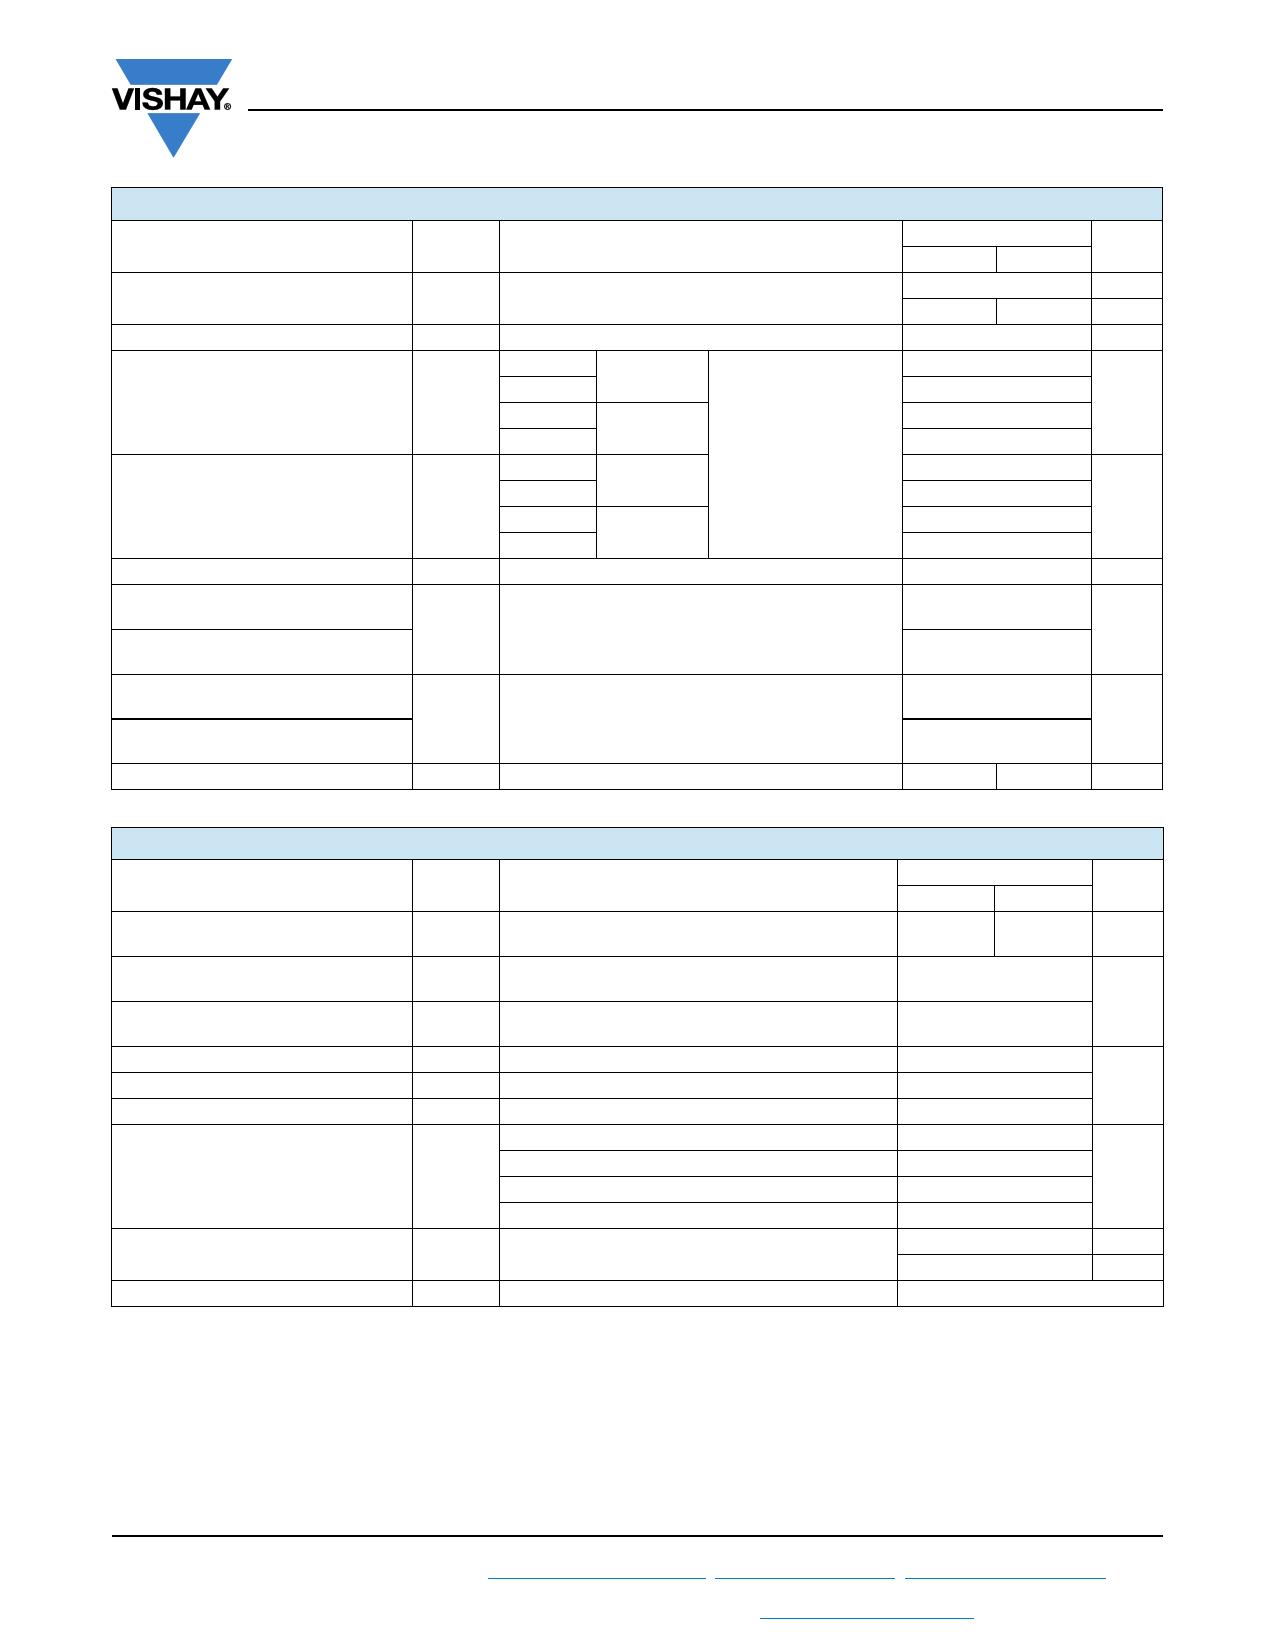 VS-88HF40 pdf, equivalent, schematic